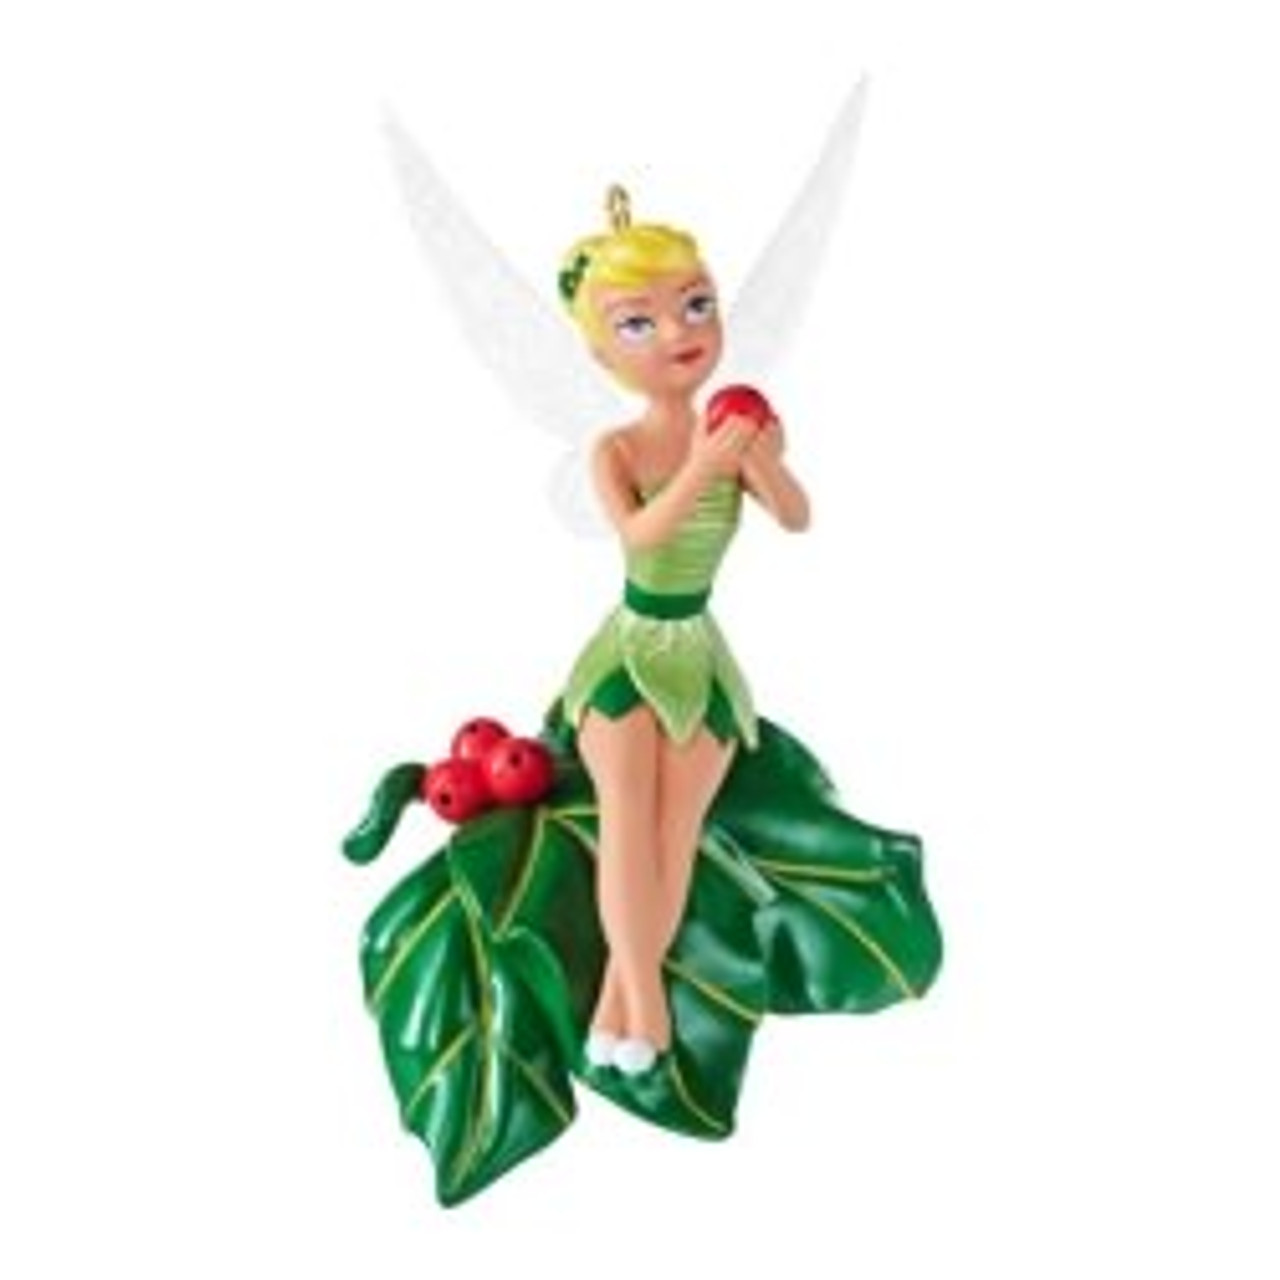 Angel From Holly's World 2013 disney - tinker bells world